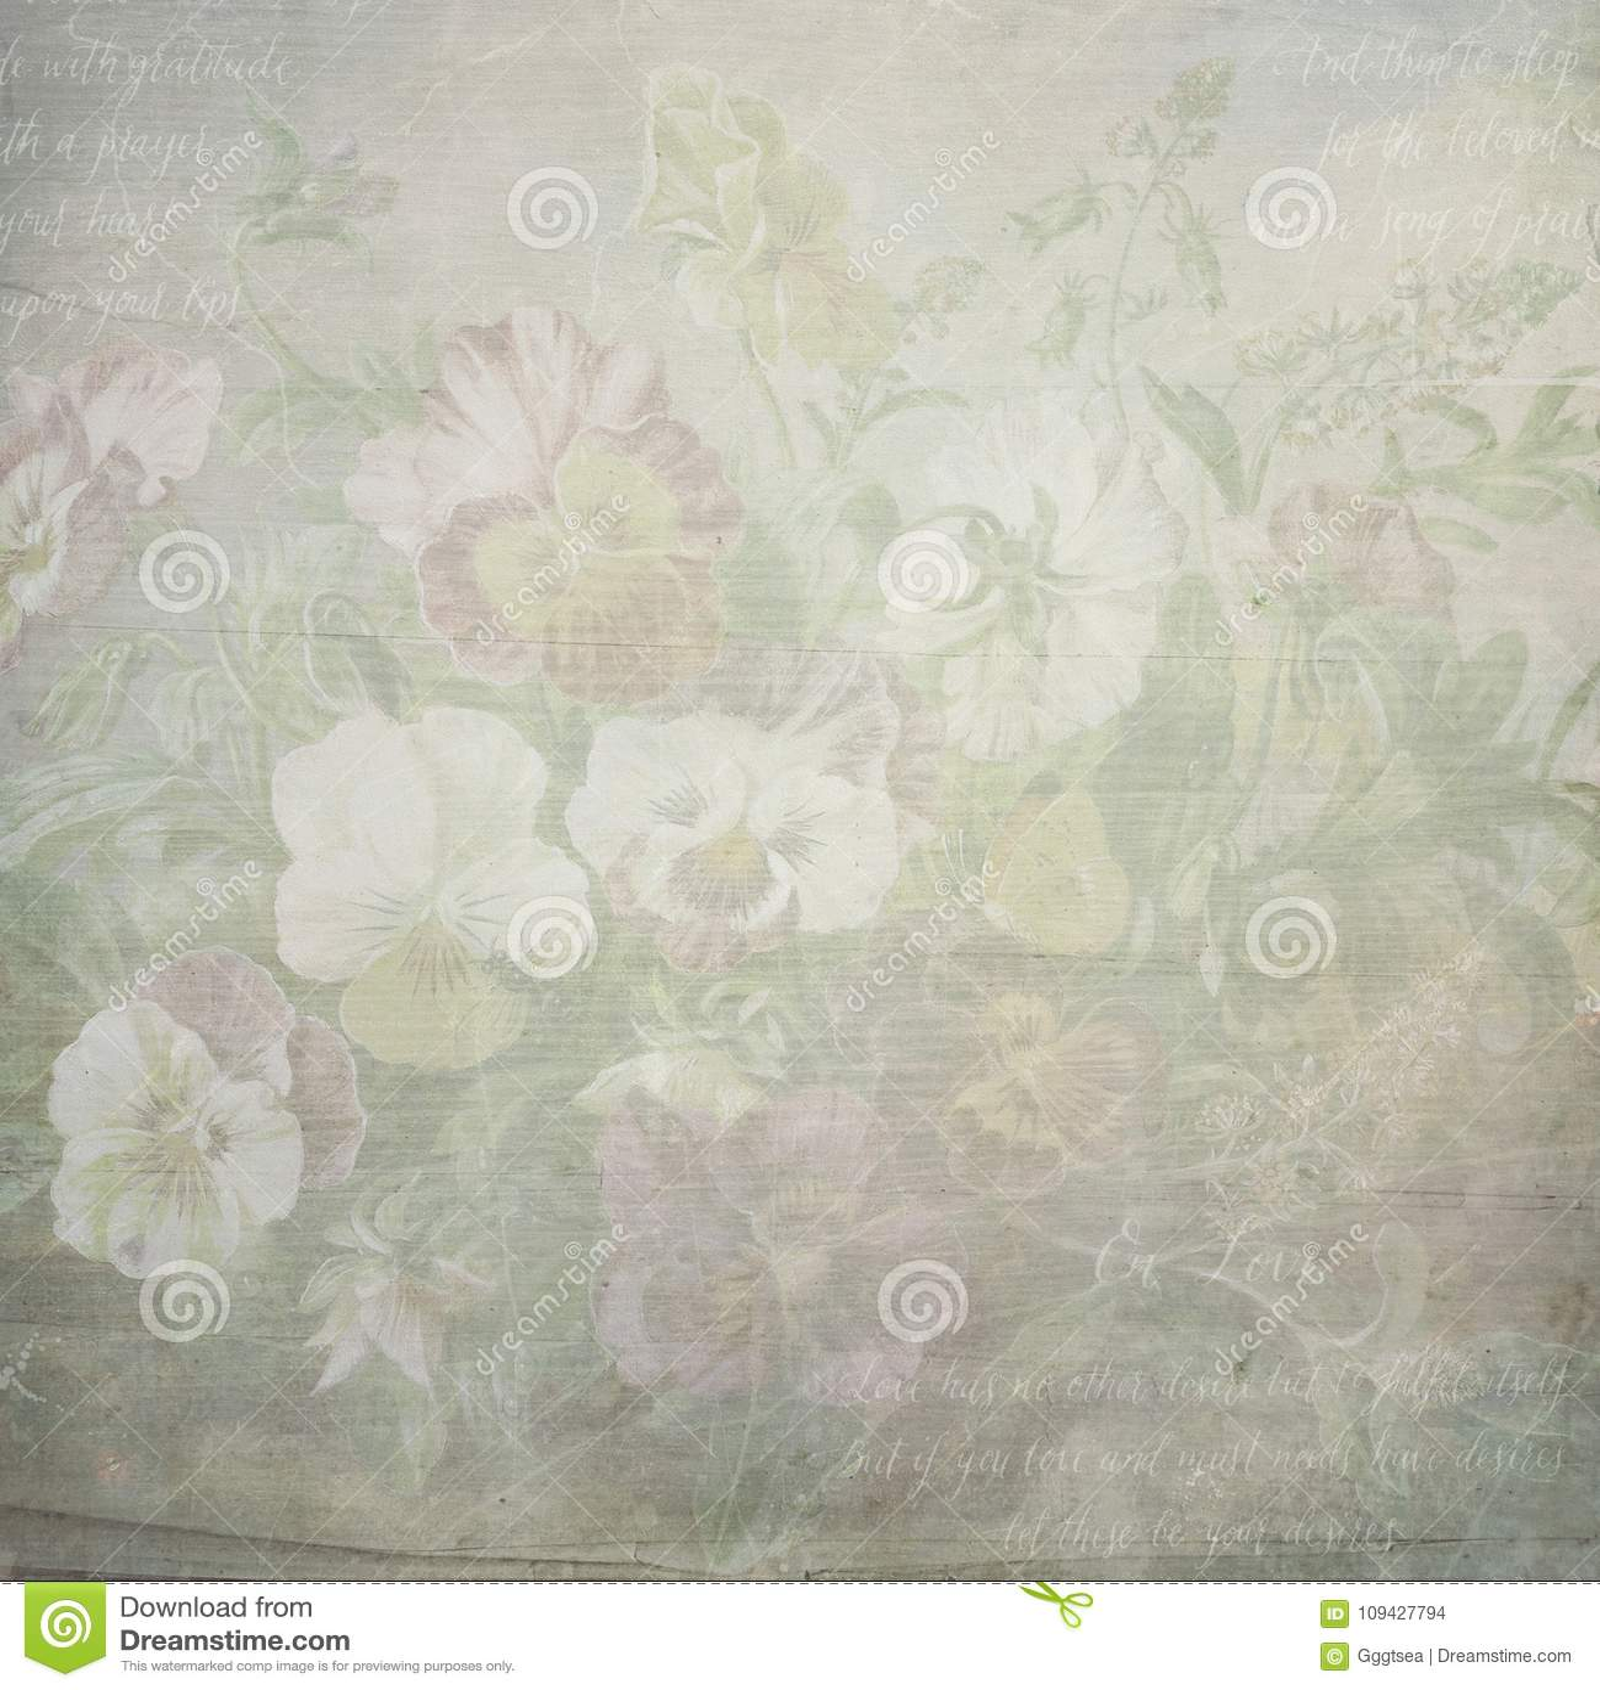 Shabby vintage botanic flowers paper texture